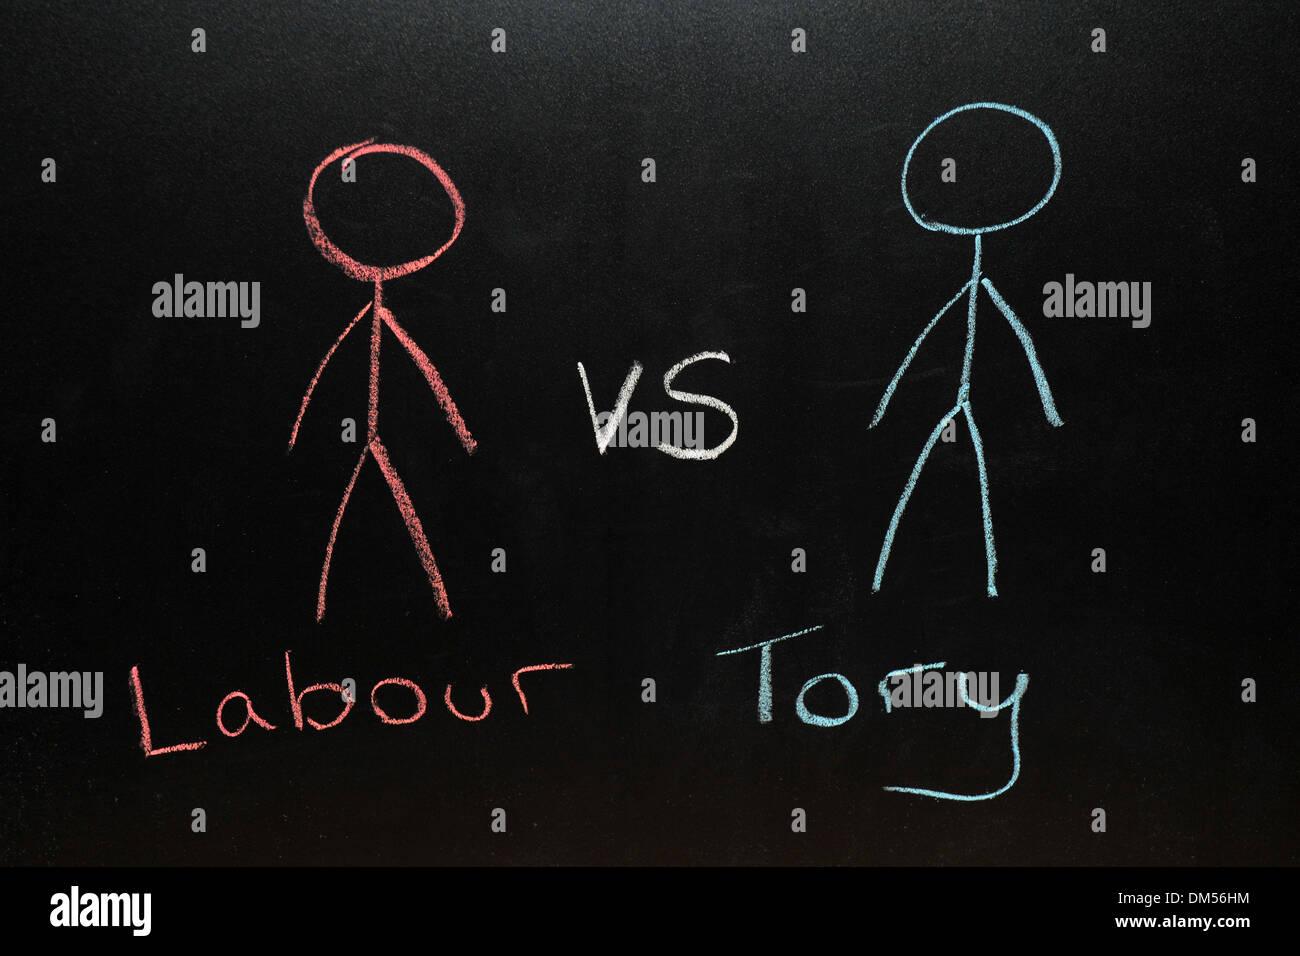 labour vs Tory drawn on a blackboard in chalk. - Stock Image